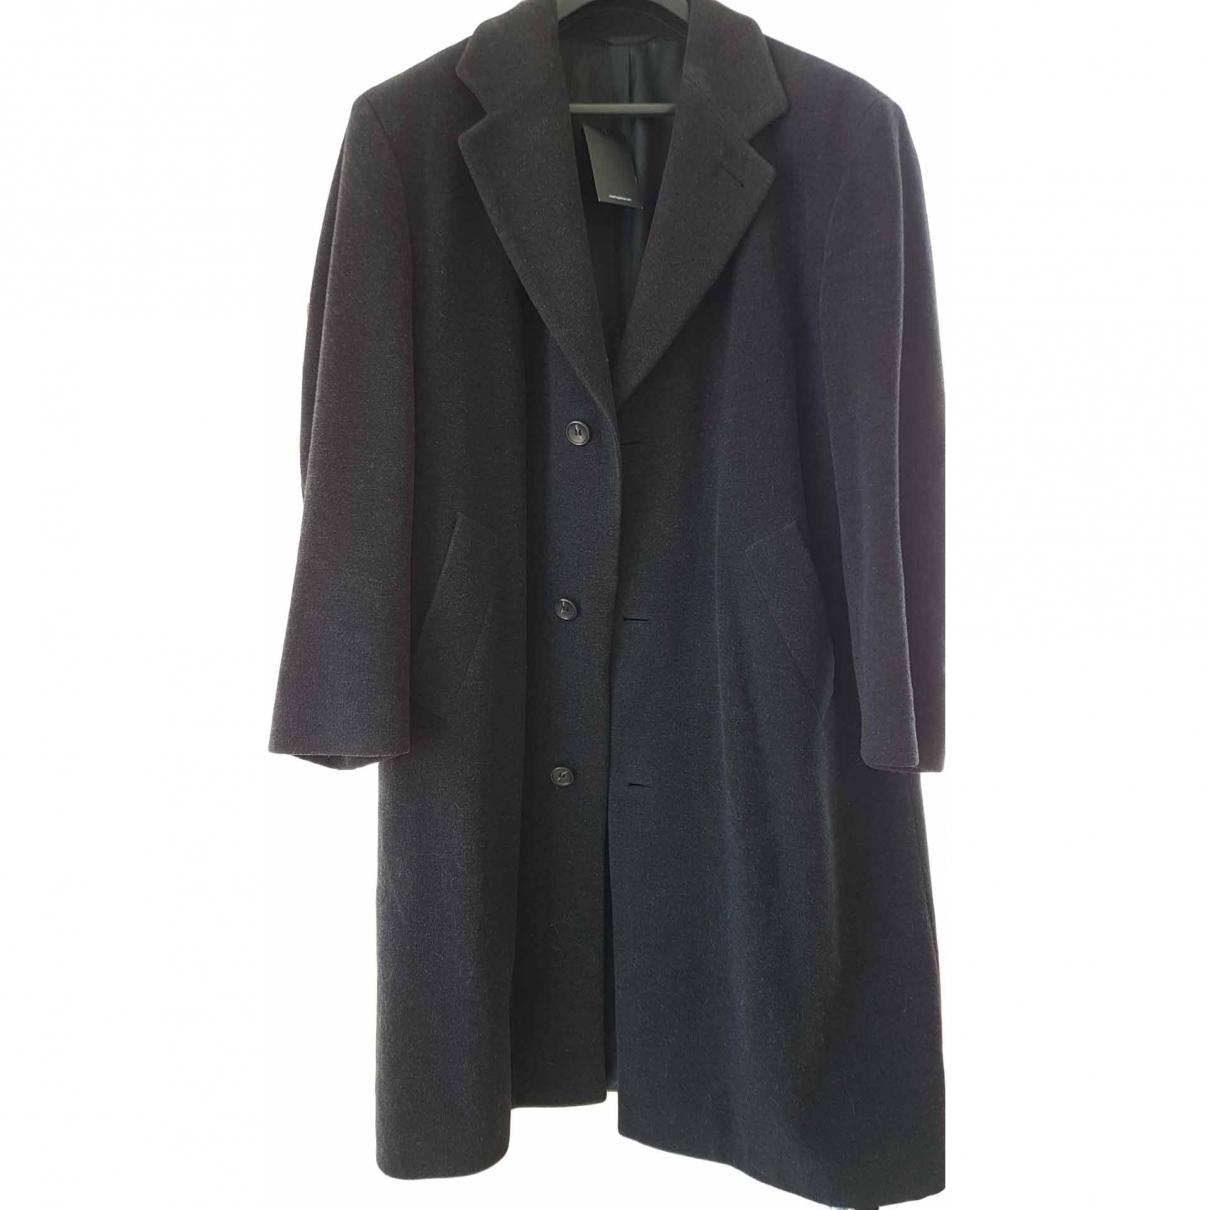 Boss \N Anthracite Wool jacket  for Men XL International